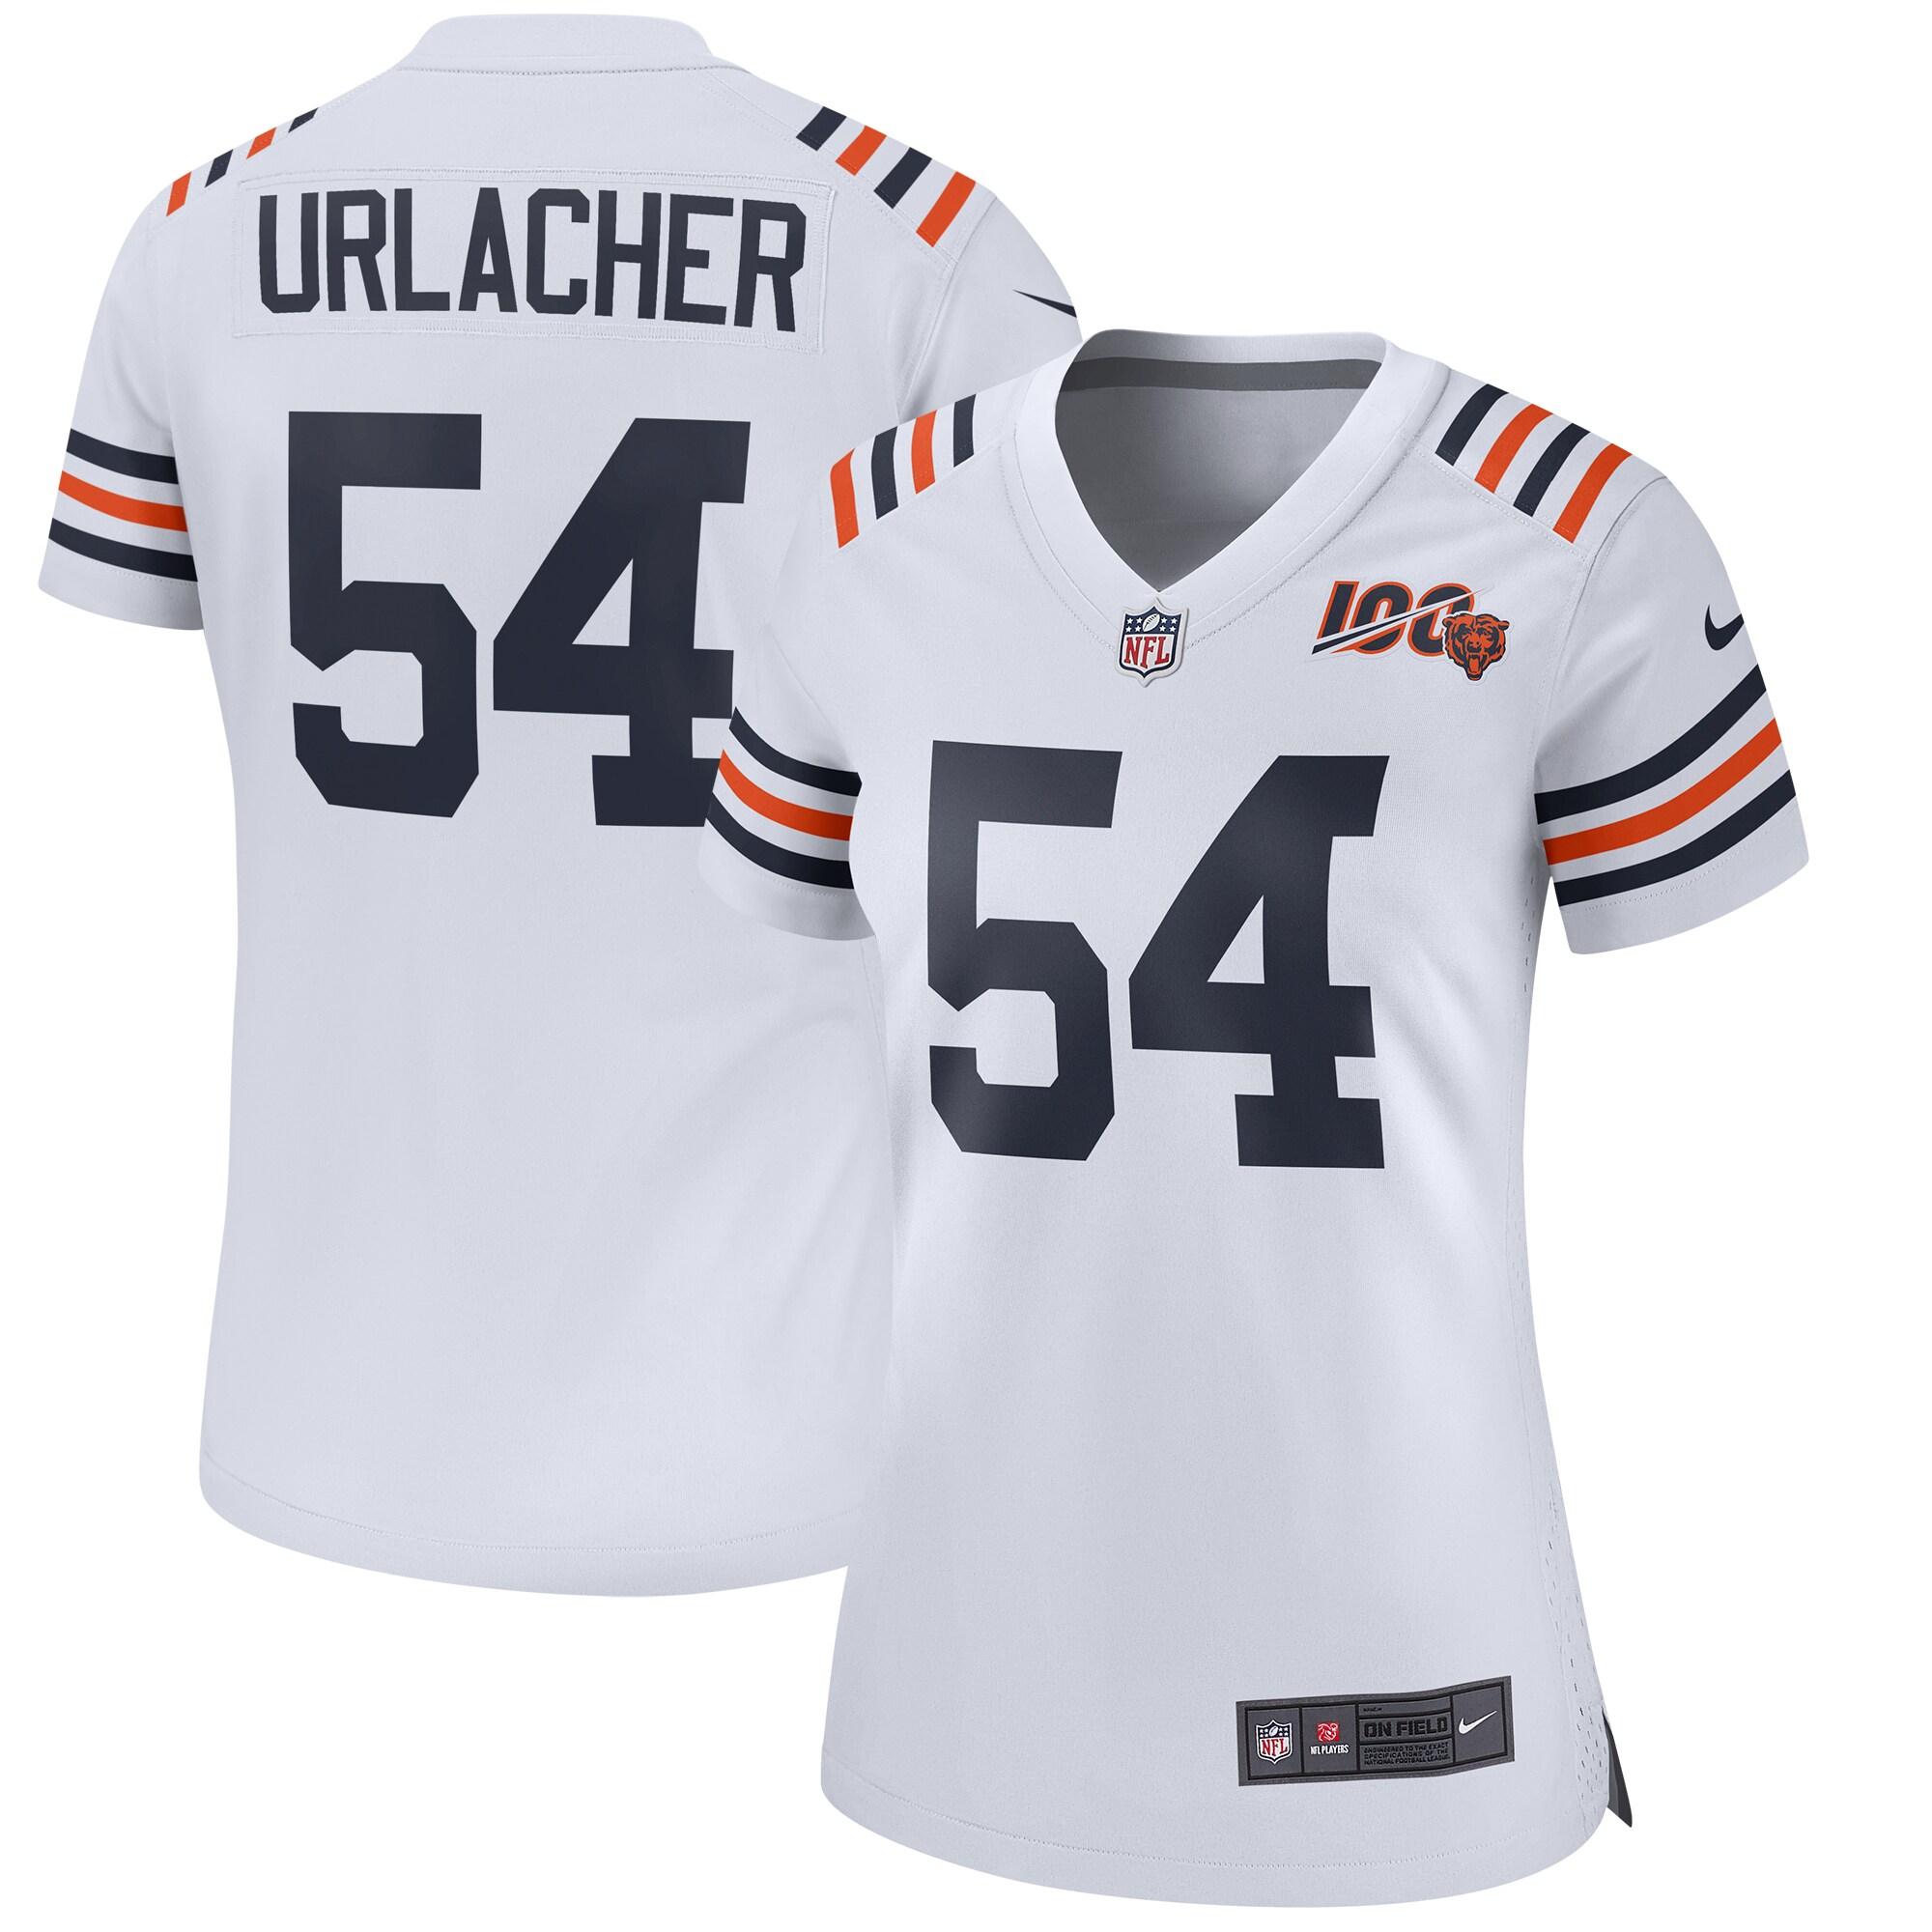 Brian Urlacher Chicago Bears Nike Women's 2019 100th Season Alternate Classic Retired Player Game Jersey - White